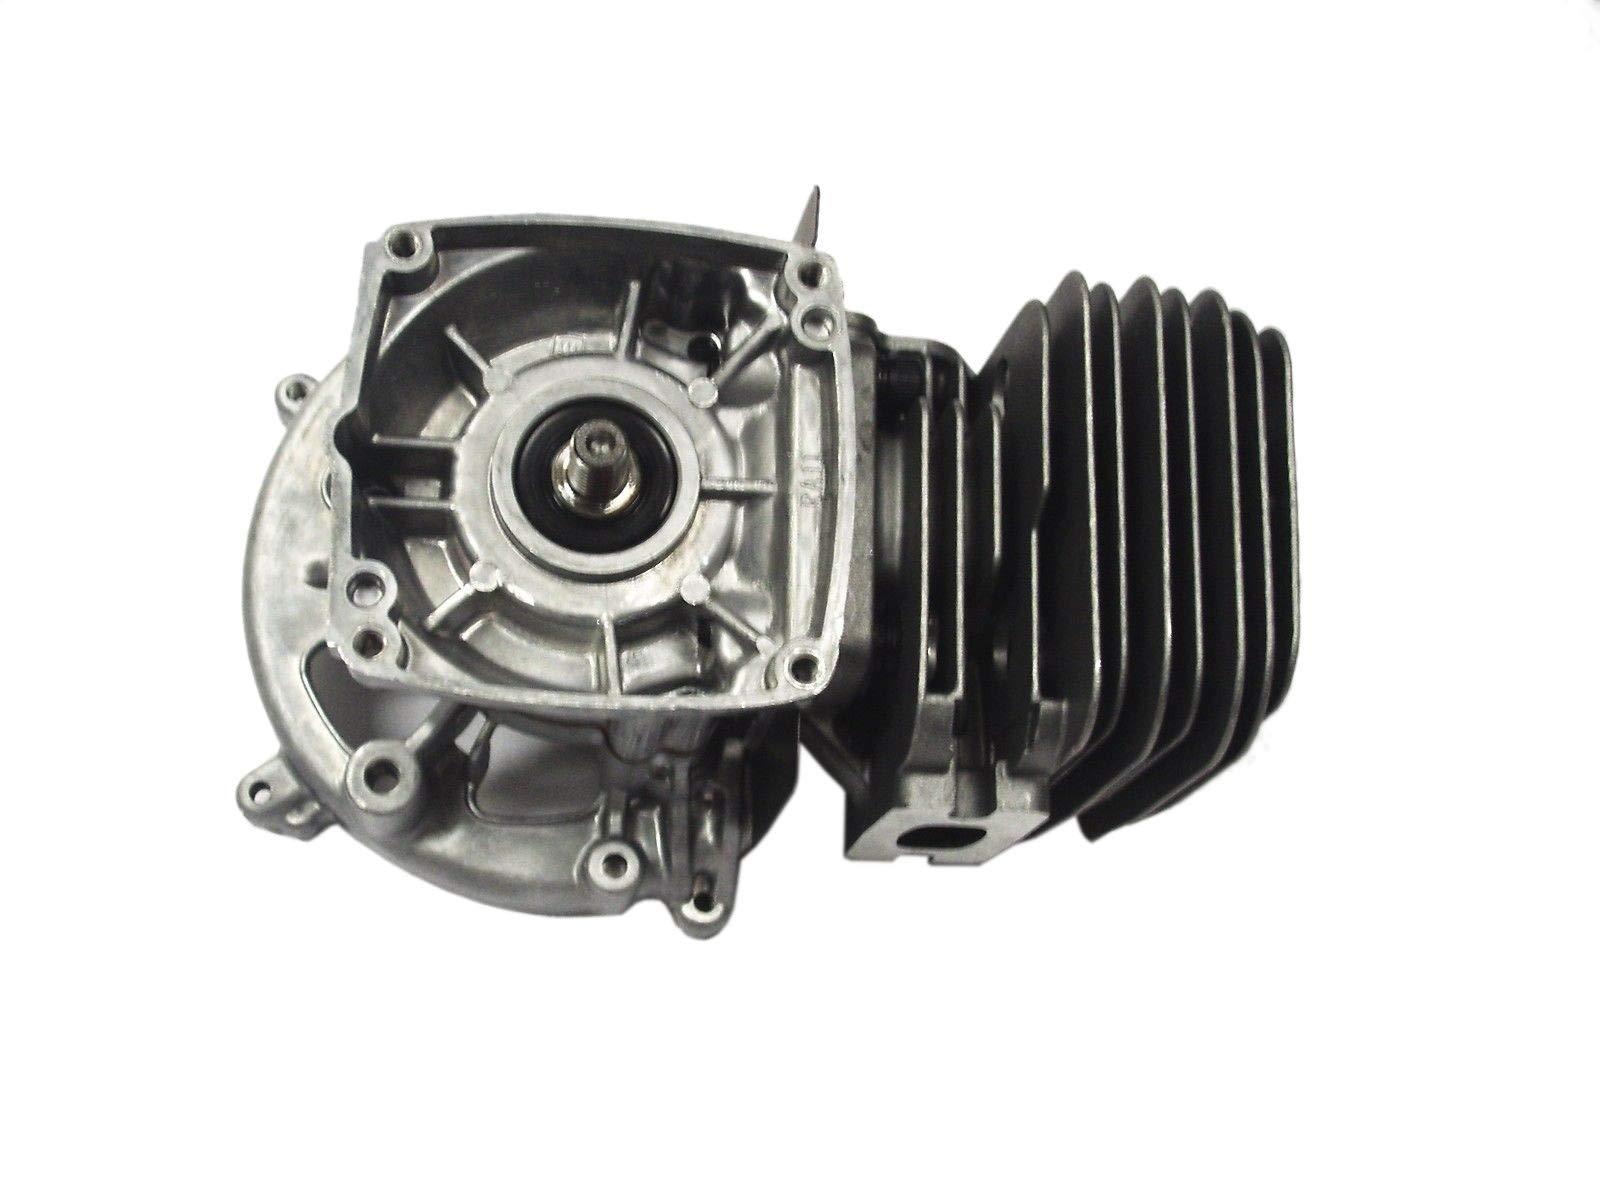 Genuine Echo SB1090 Engine Short Block Replaces SB1102 Fits SRM-265 SHC-265 HCA-266 SRM-266 Trimmers